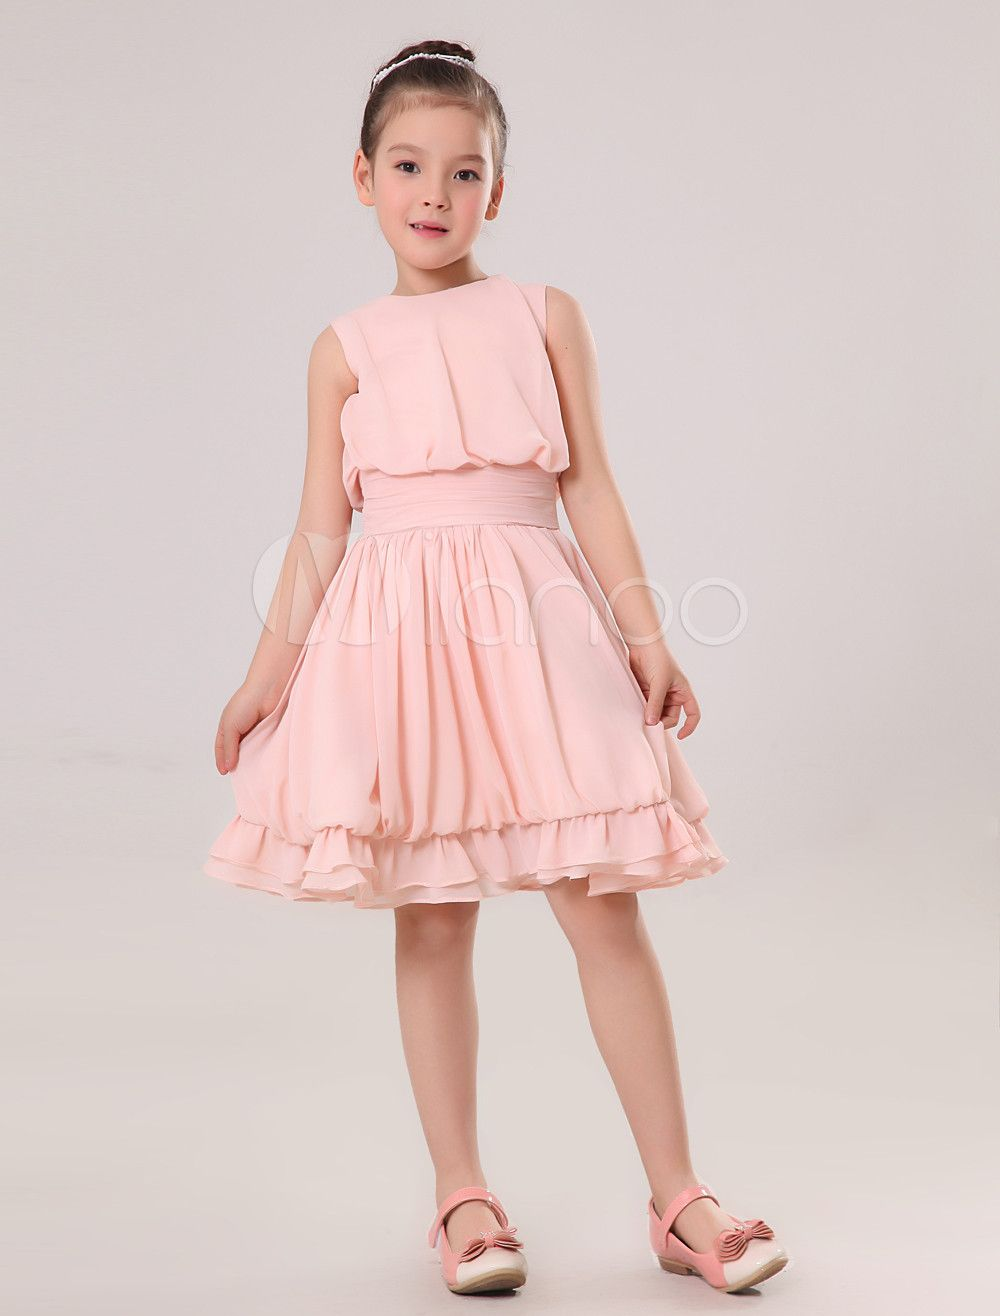 Pink junior bridesmaid dresses google search junior bridesmaid pink junior bridesmaid dresses google search ombrellifo Gallery